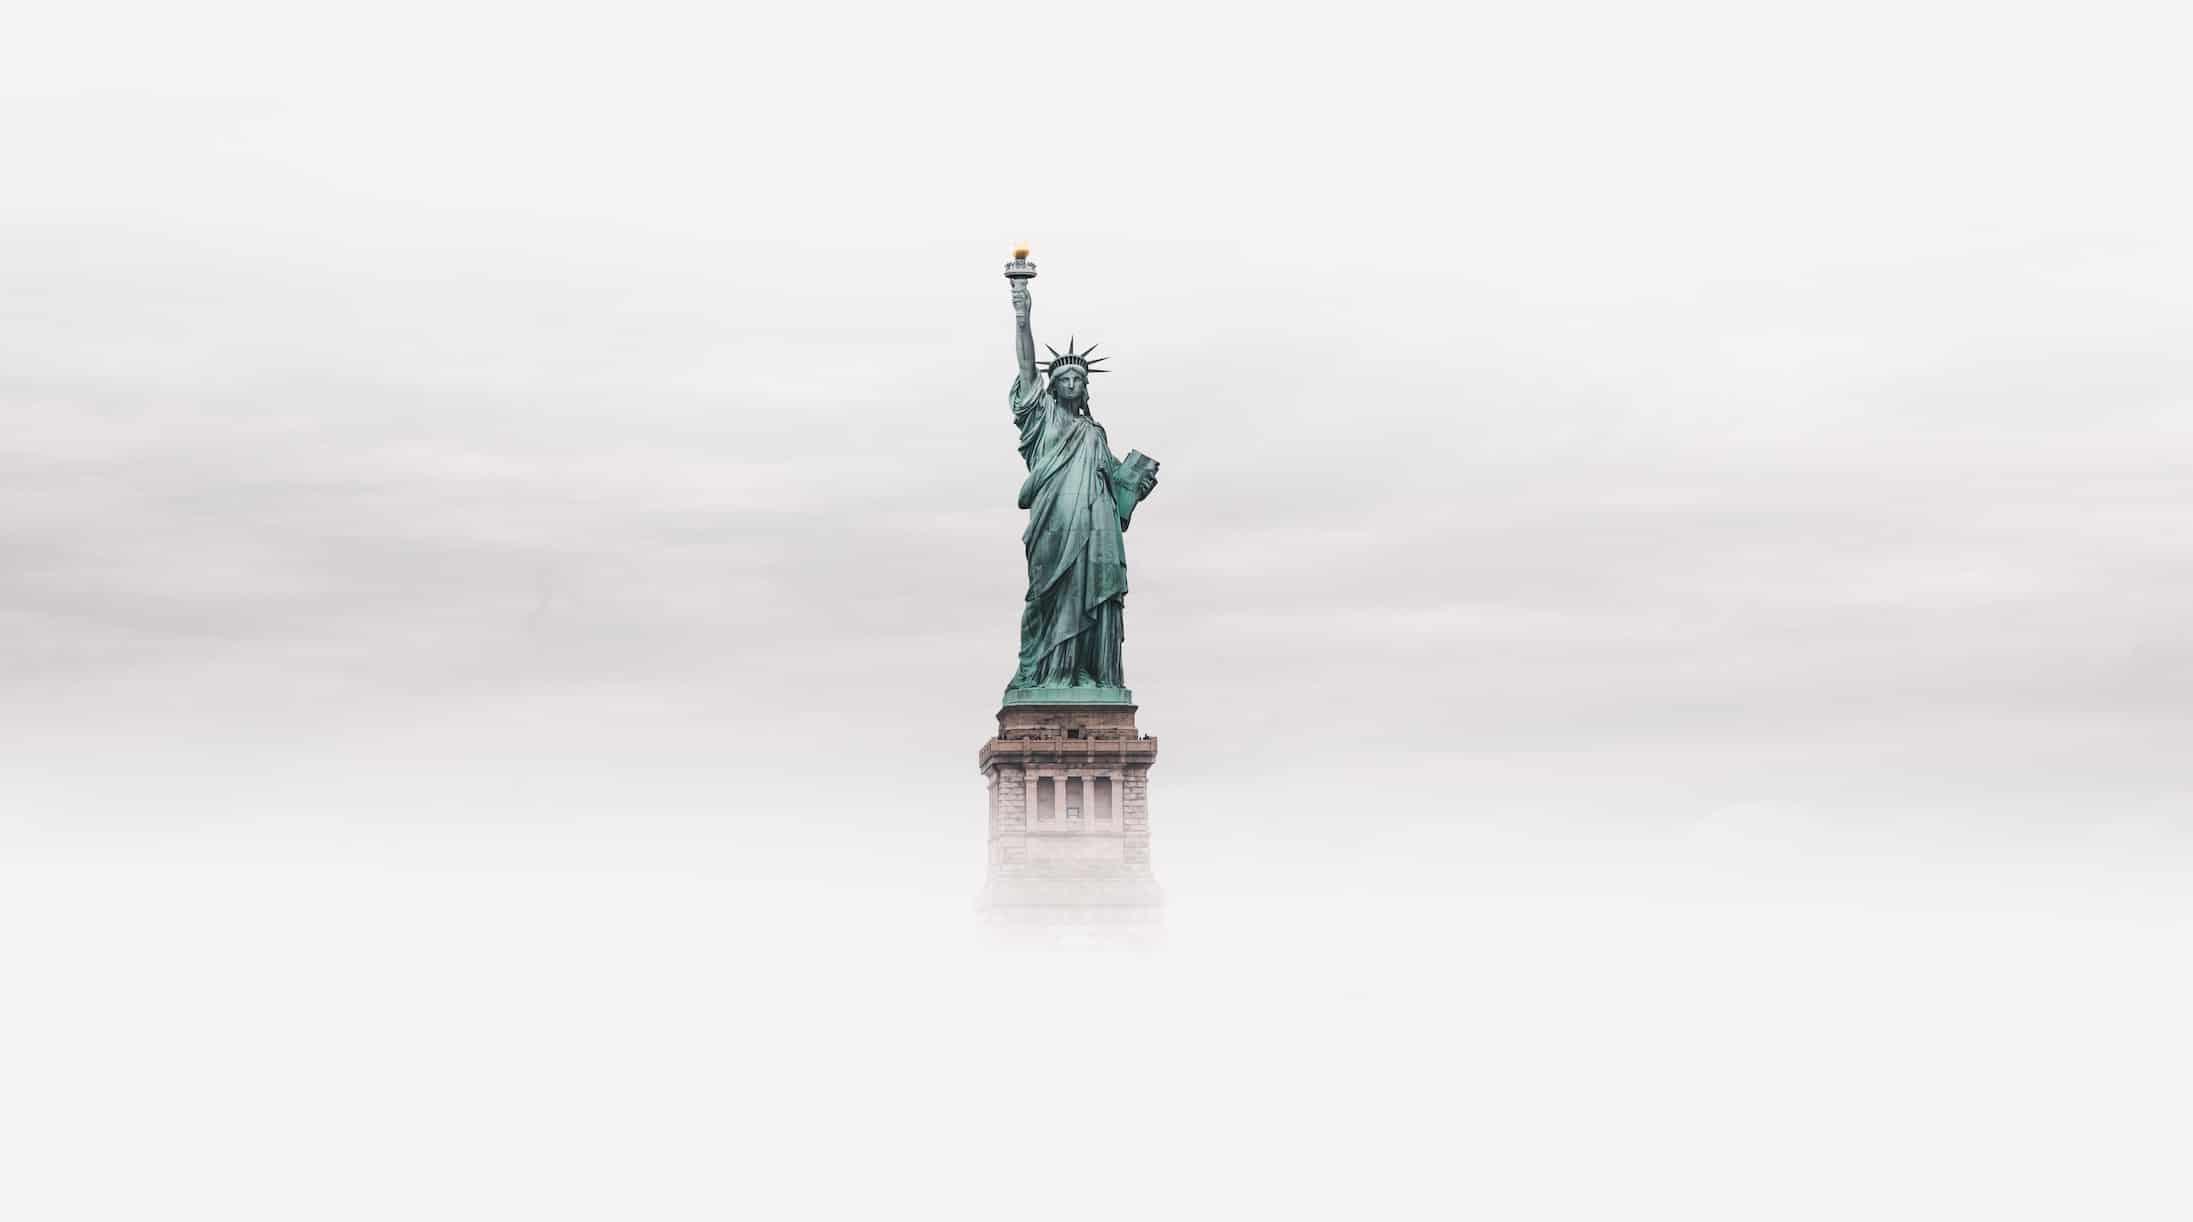 American Statue of Liberty